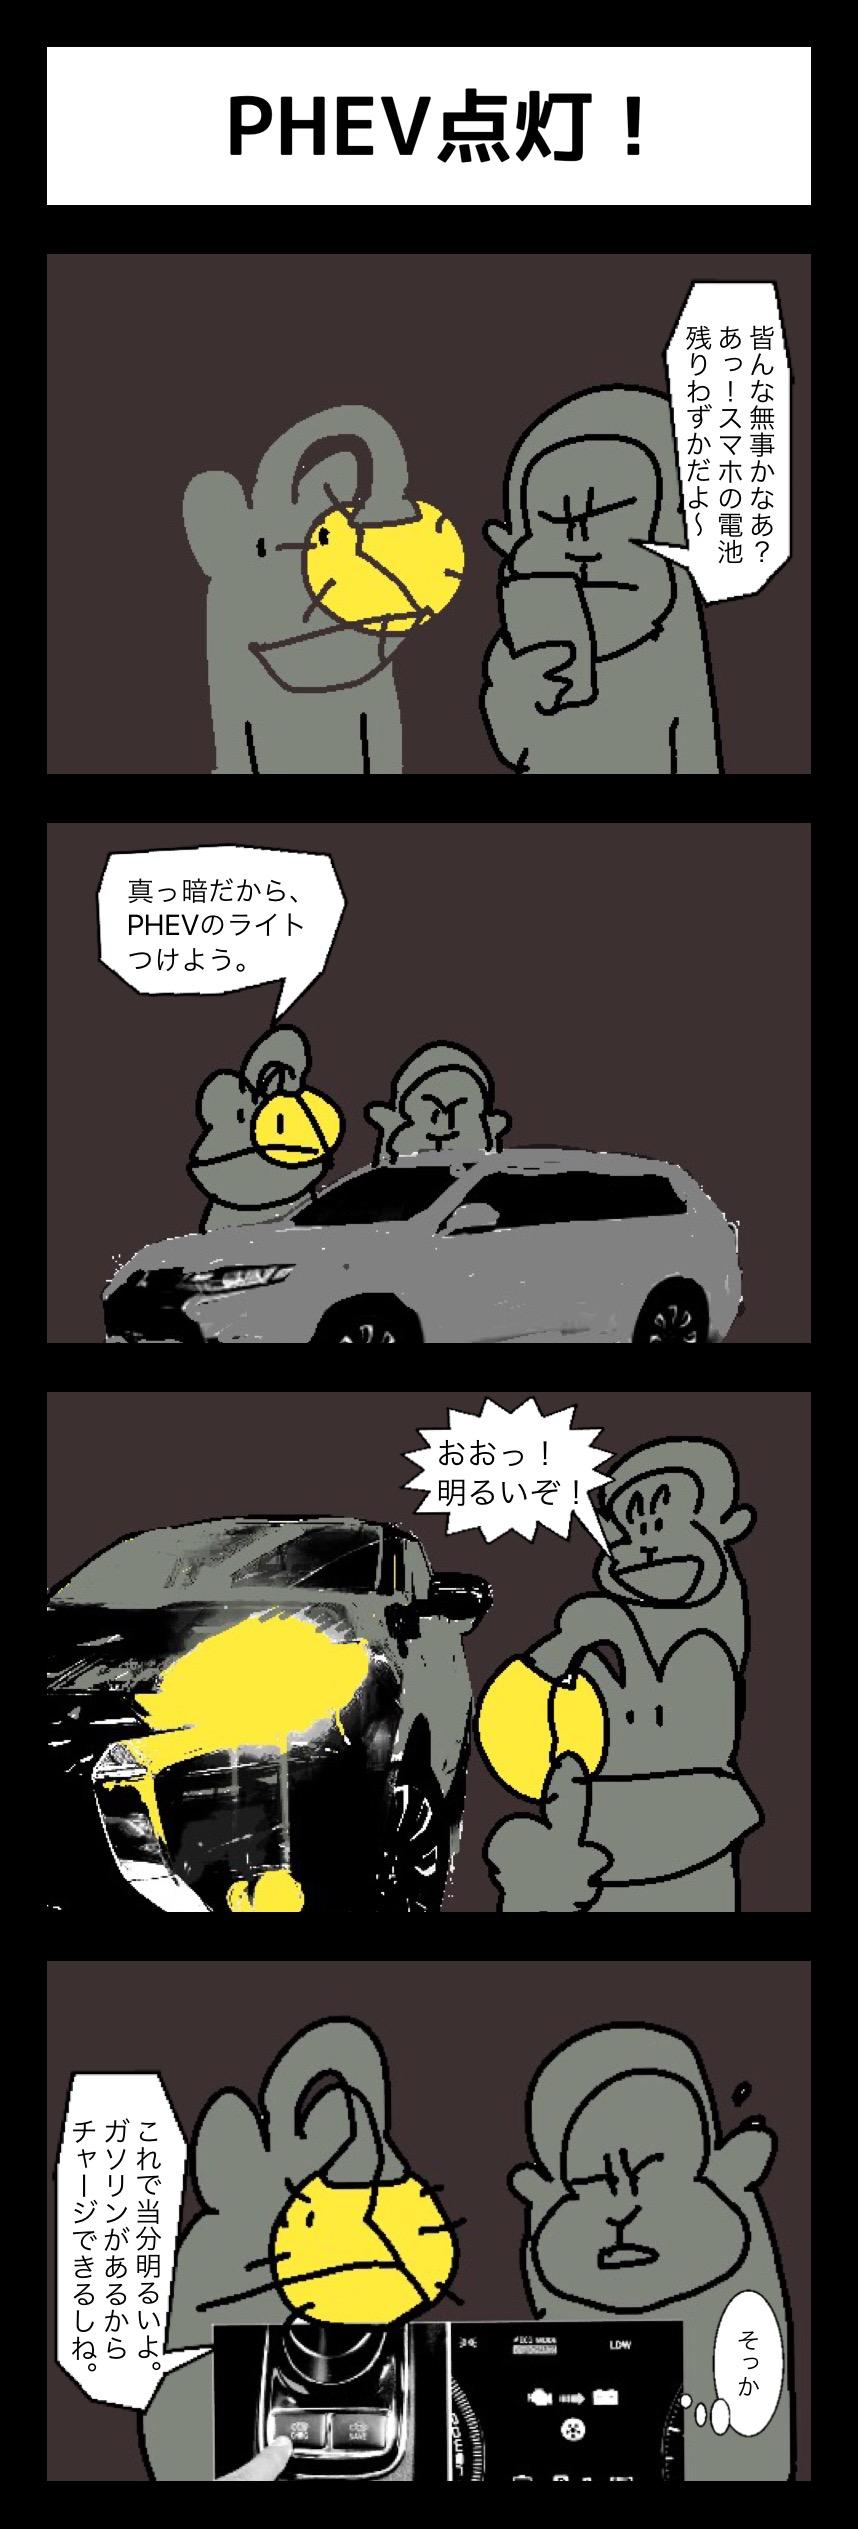 PHEV鳥獣戯画 その42「PHEV点灯!」